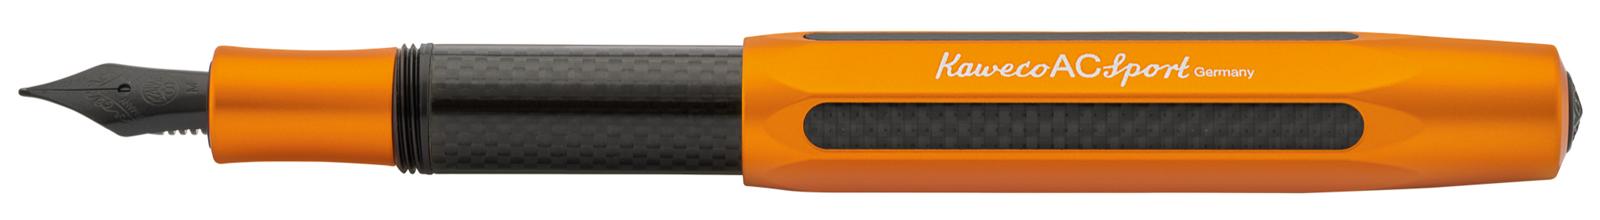 Kaweco AC Sport Carbon Oranje Vulpen